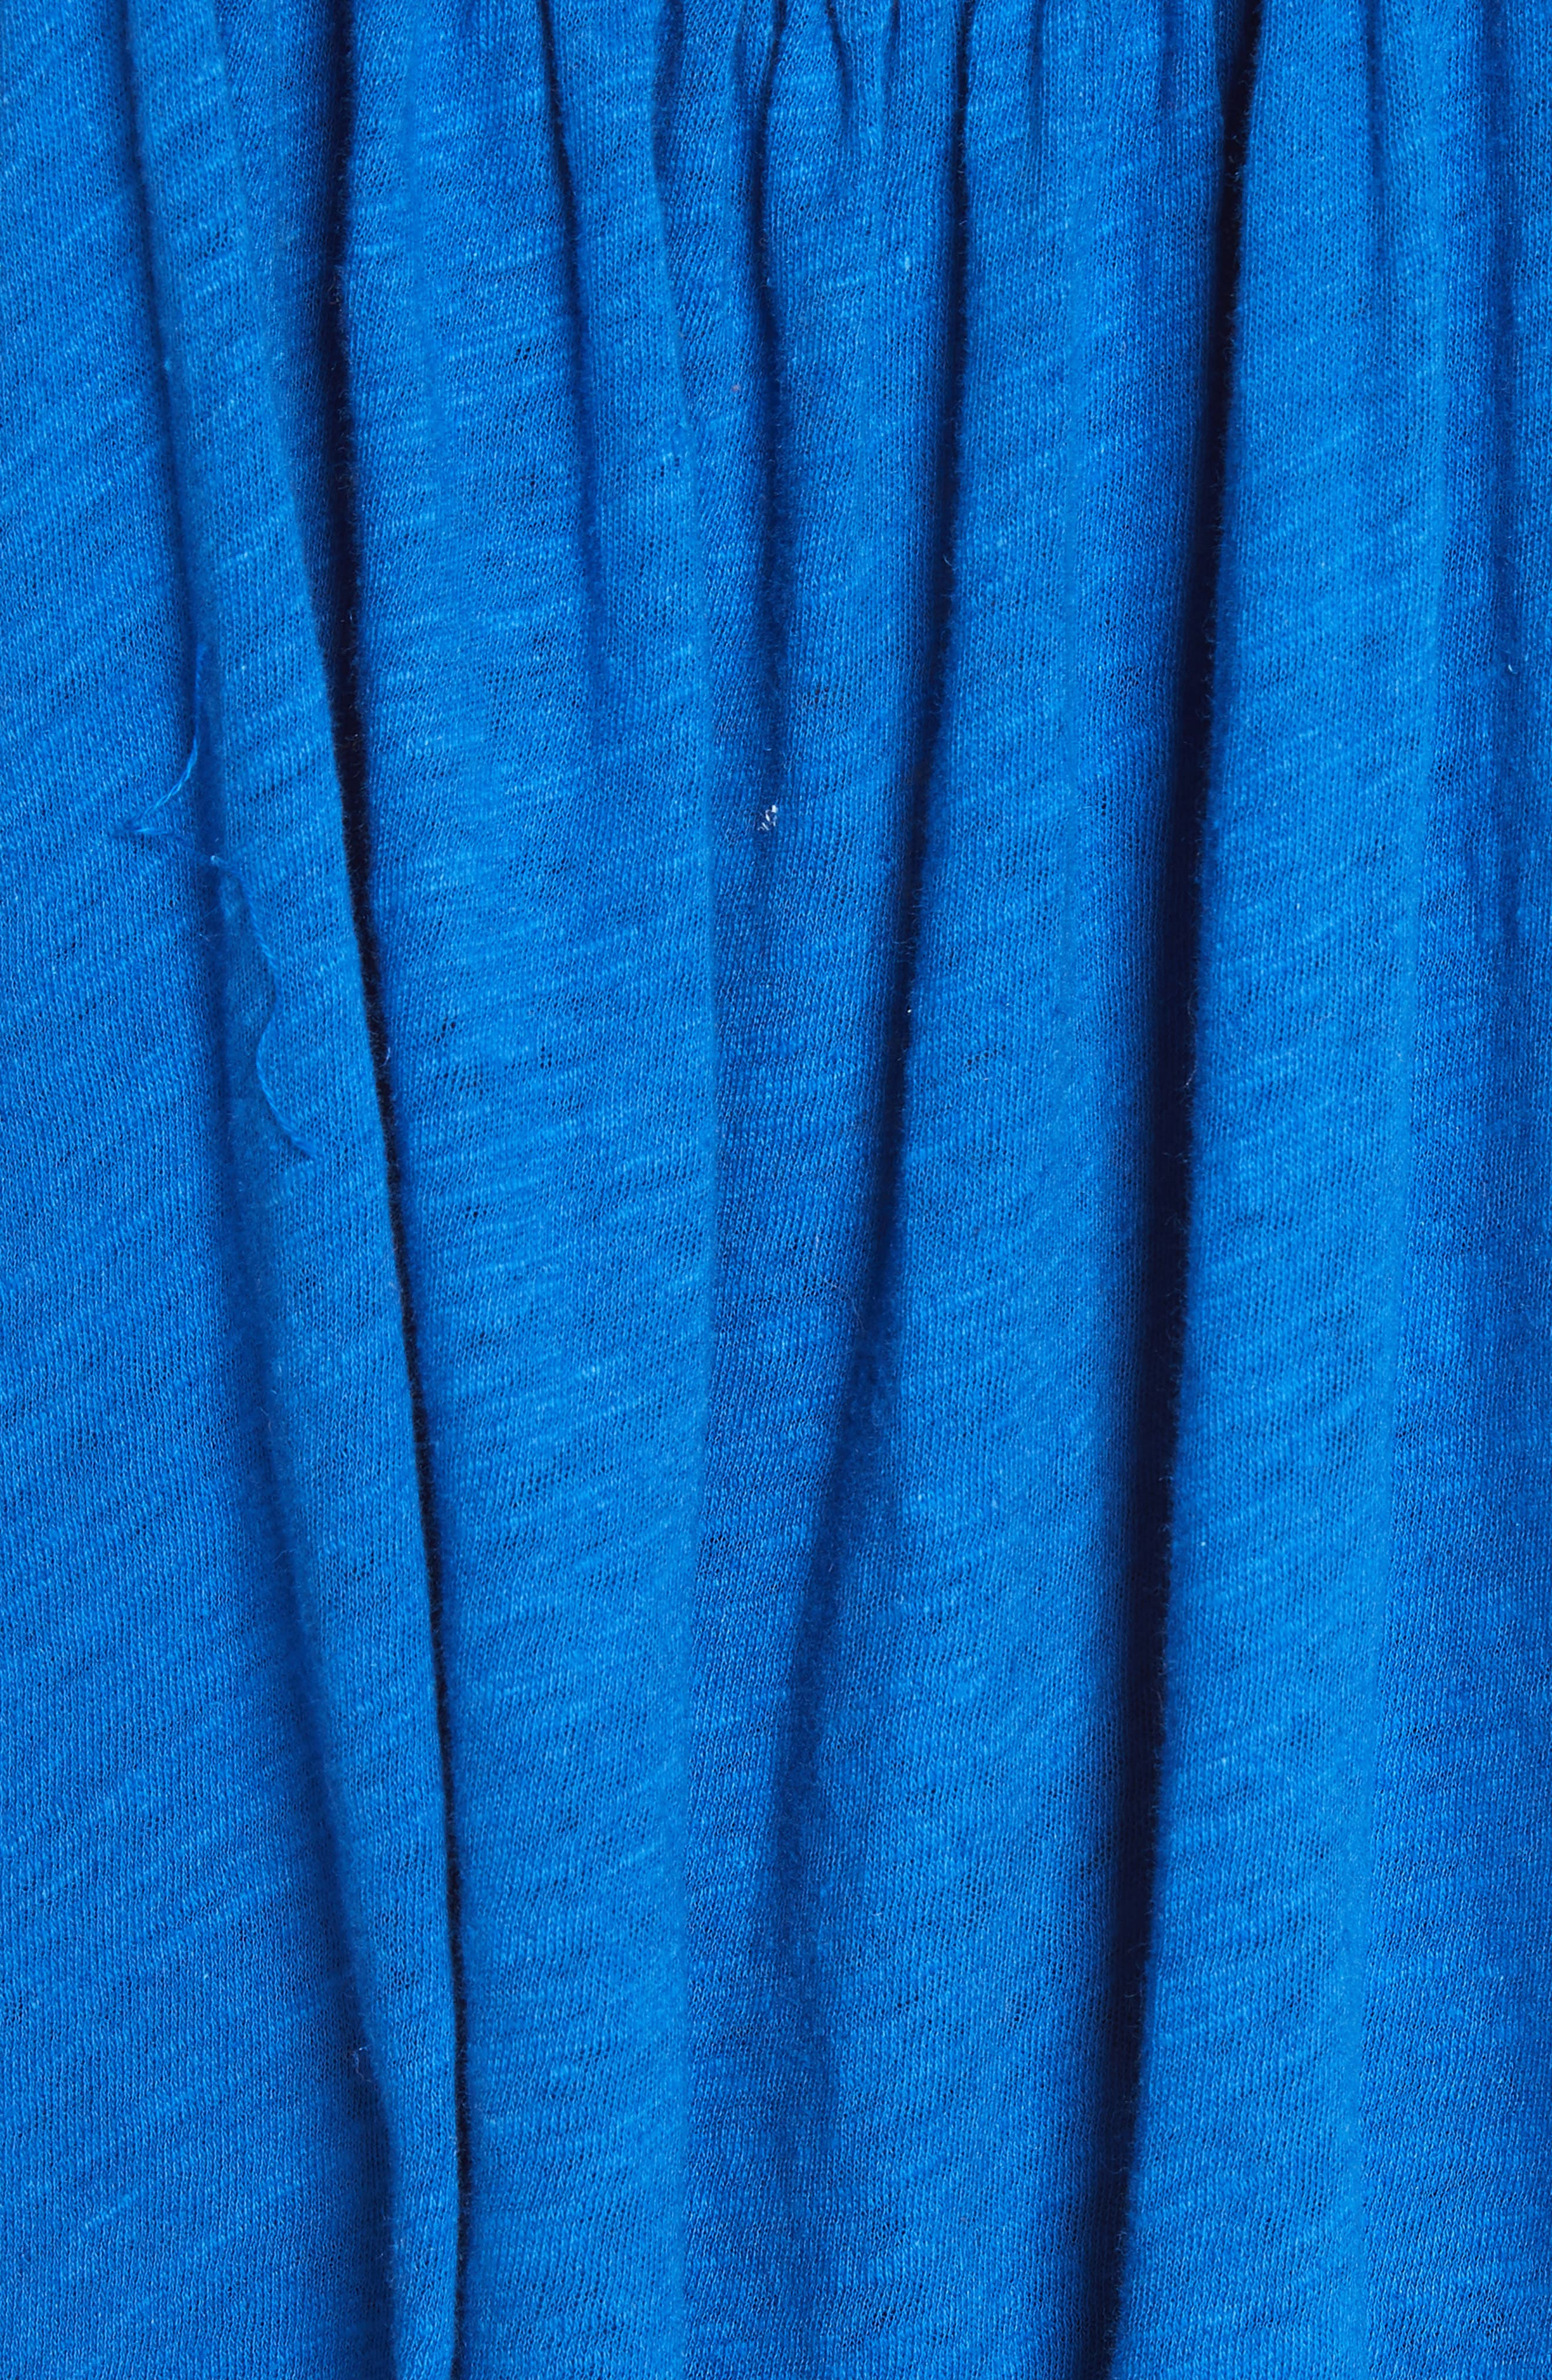 Road Trip Knit Tank,                             Alternate thumbnail 5, color,                             Blue